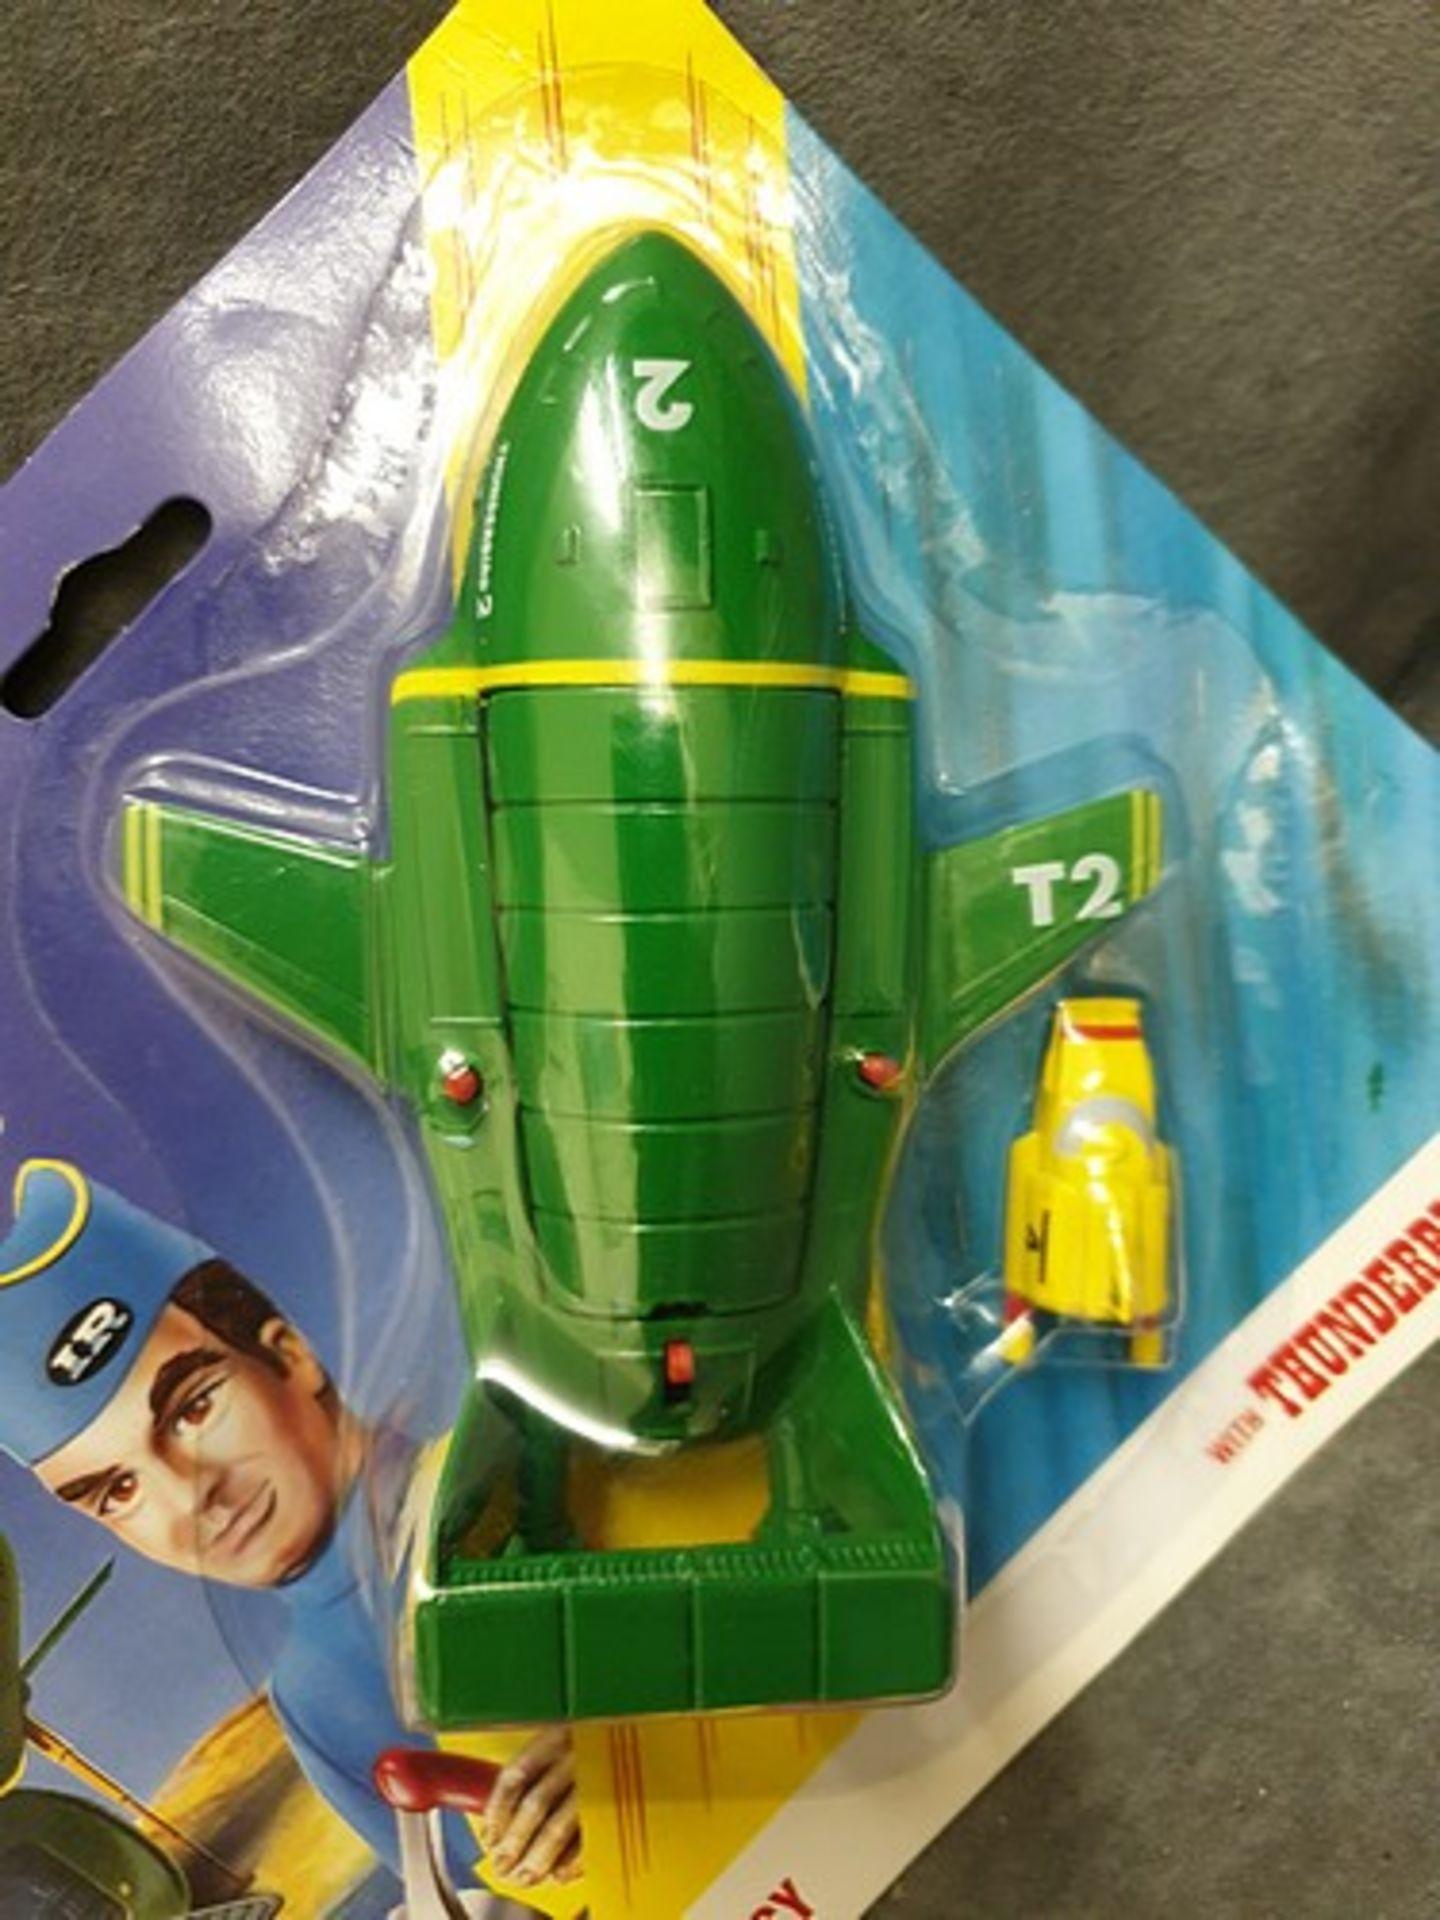 Matchbox Thunderbirds #TB-002 Virgil Tracy's Thunderbird 2 On Unopened Card - Image 2 of 2